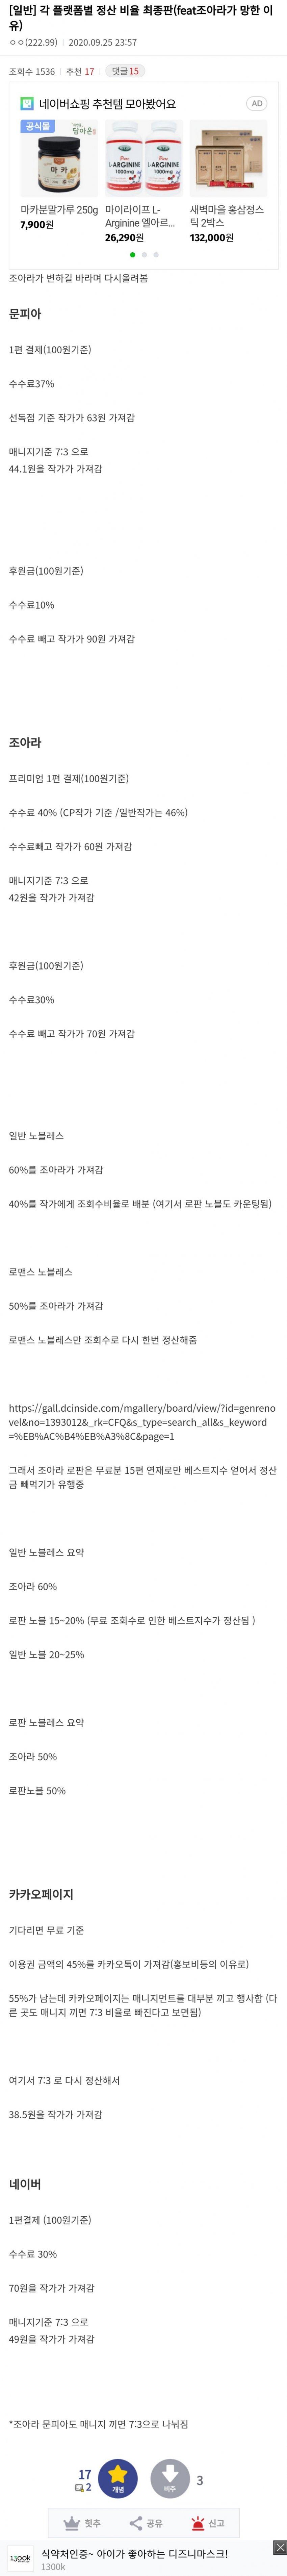 viewimage.php?id=2ab8de34e0dc37b06bb3&no=24b0d769e1d32ca73cec8ffa11d0283137a147df66c0ff0e9ff48d5b5d7b56d2524b4744f7165ab149e61d41dce9271e9be5878a822e8b08b8e885eda3cbf1bb7a3cc45cc5ff4c55a9d561cb2a09926e961be950a092fe65cb9cfc4a8b1e830ef849002b34a58dd745348f4894